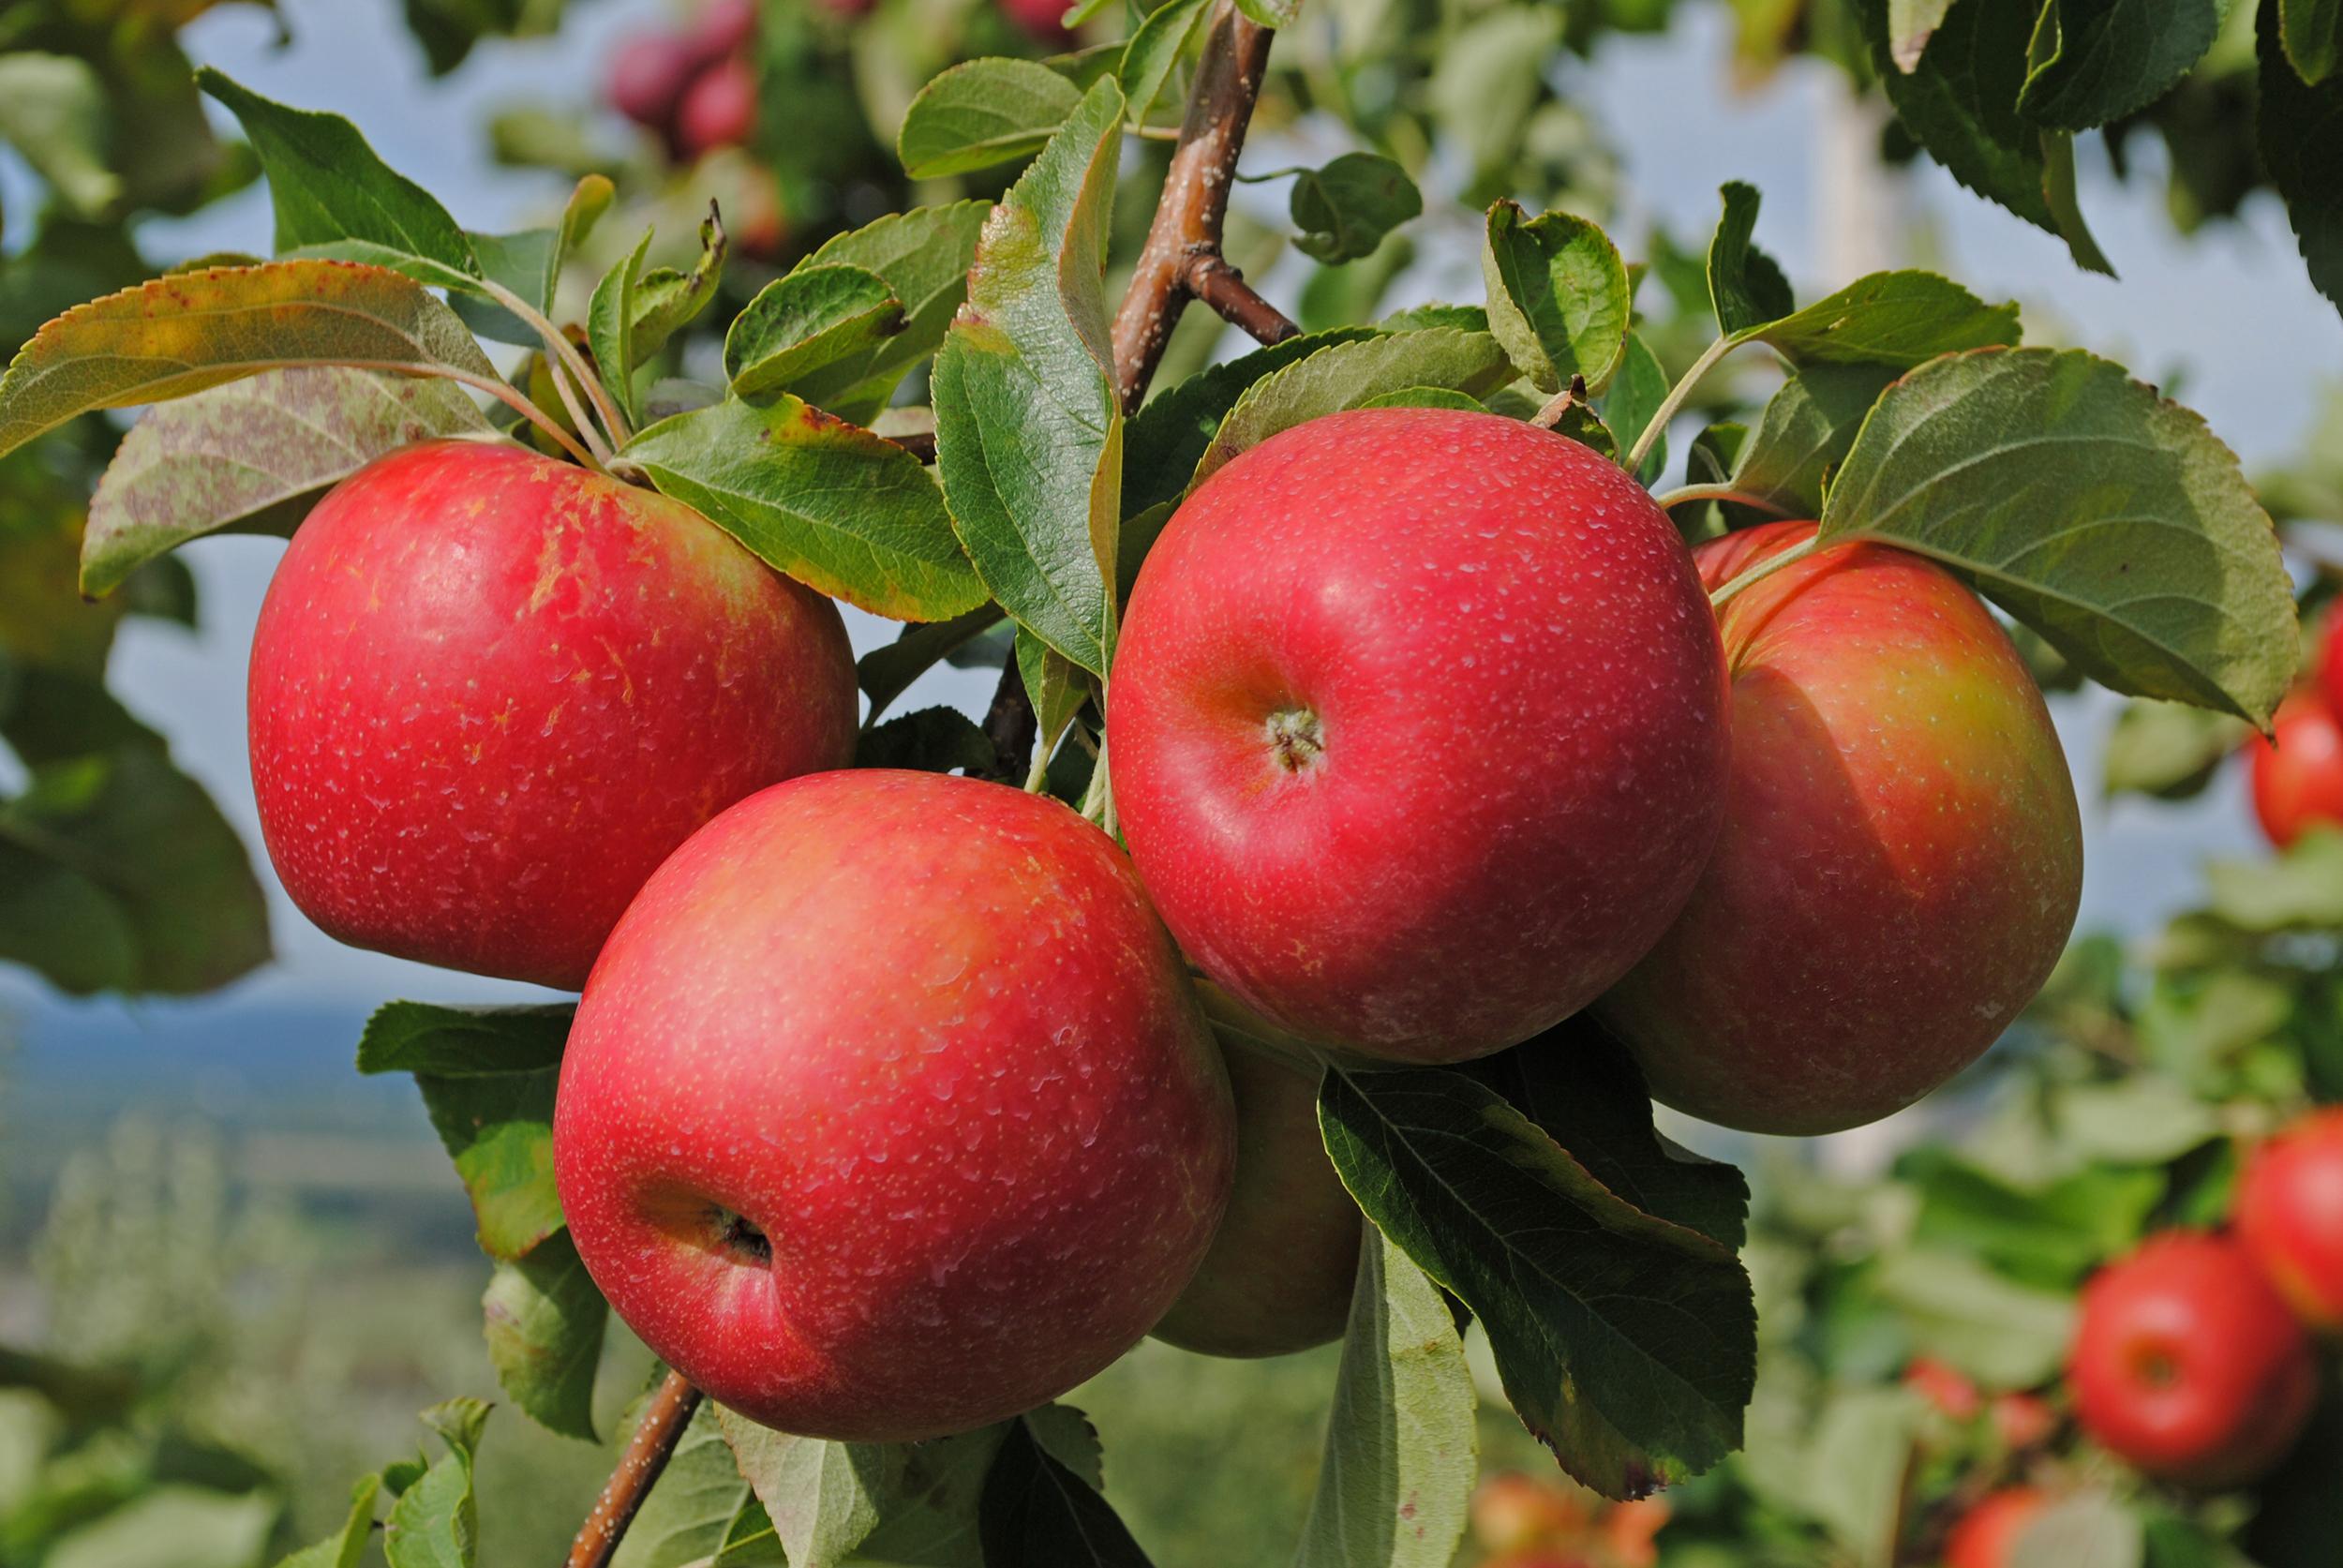 Картинки Яблоки На Ветке